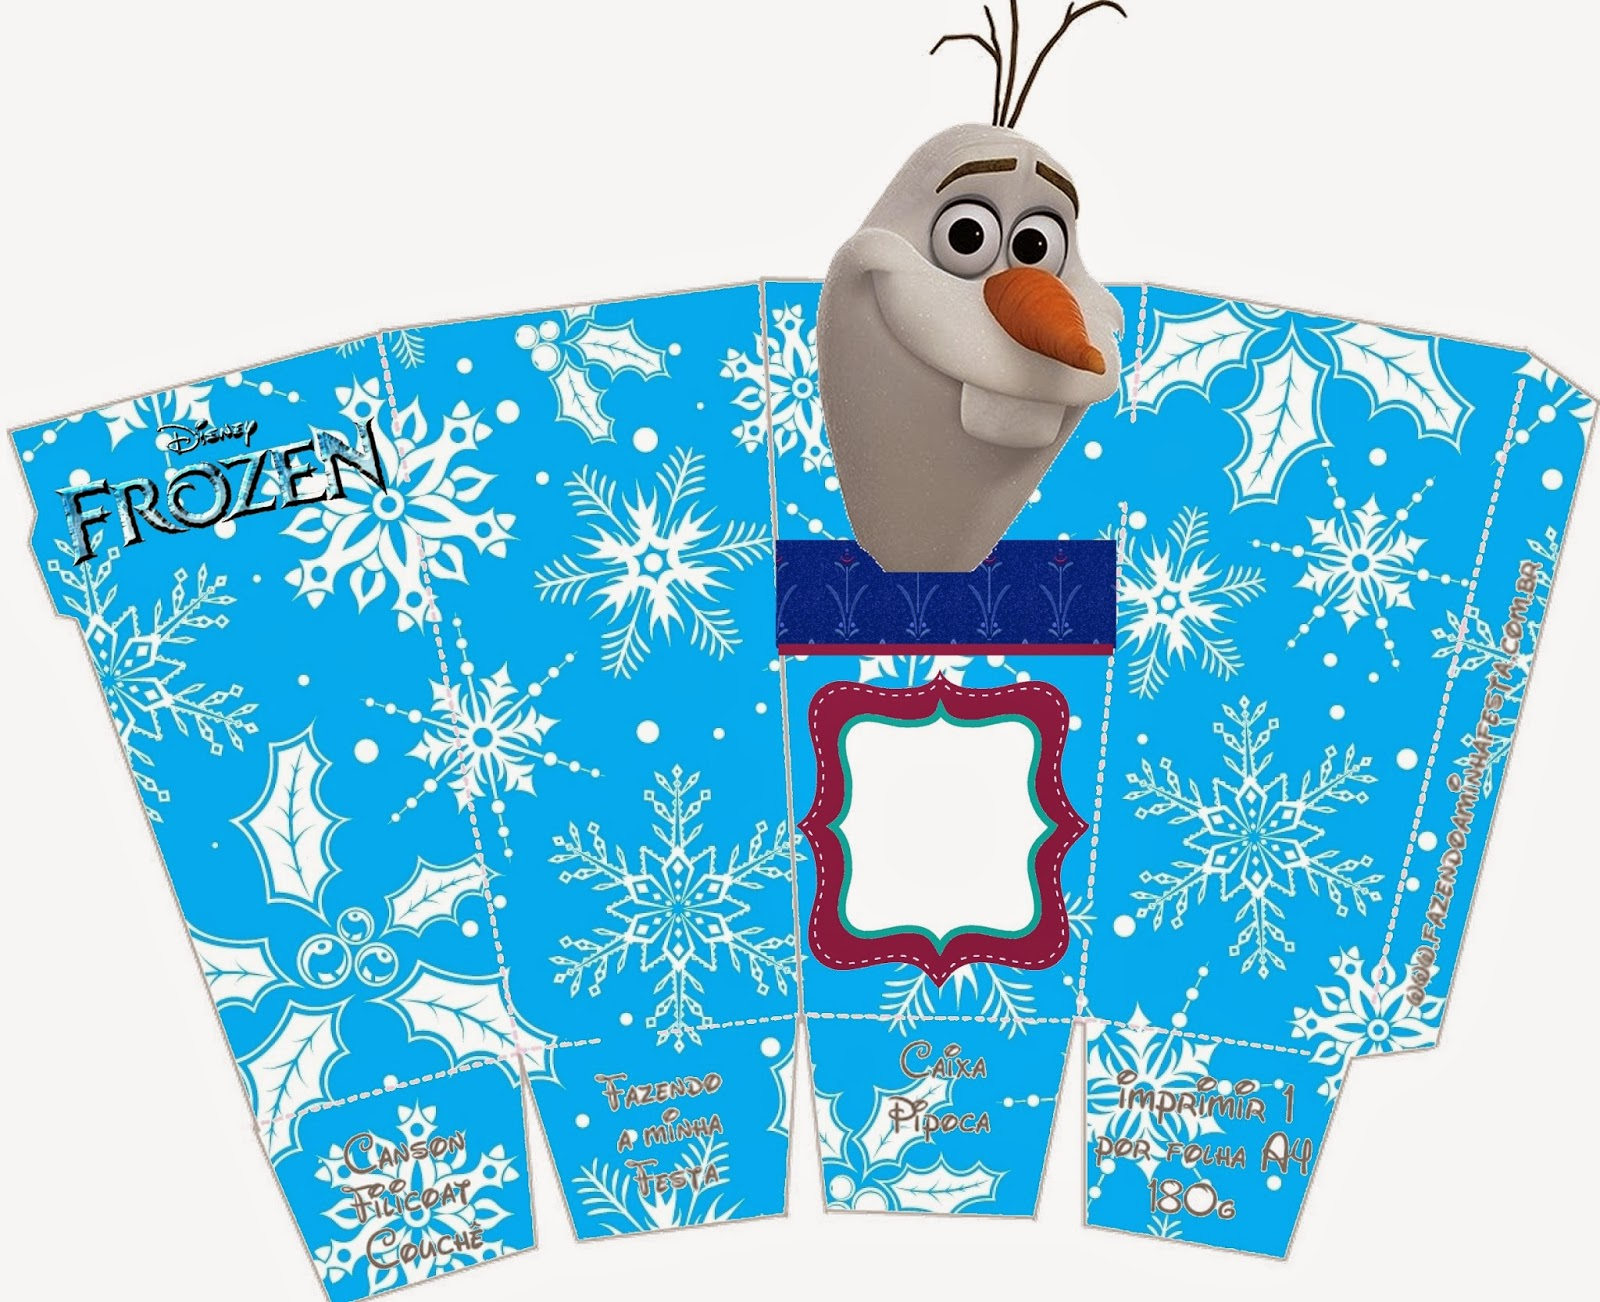 Frozen: Caja de Olaf para Popcorn, para Imprimir Gratis.